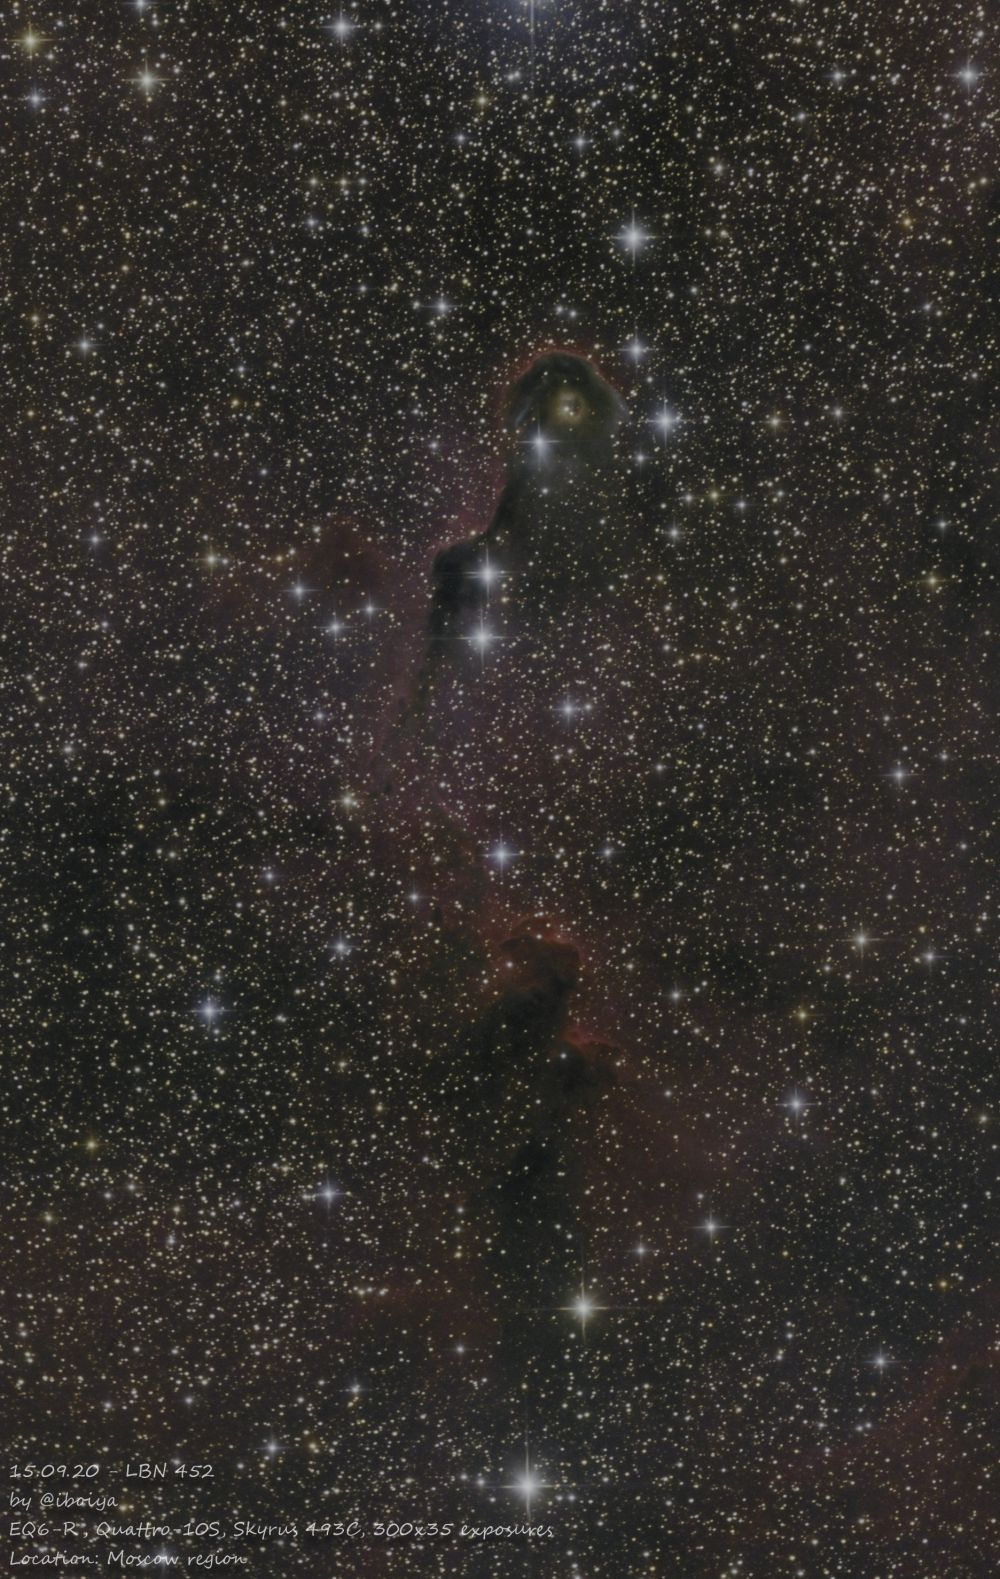 LBN 452 Elephant Trunk nebula